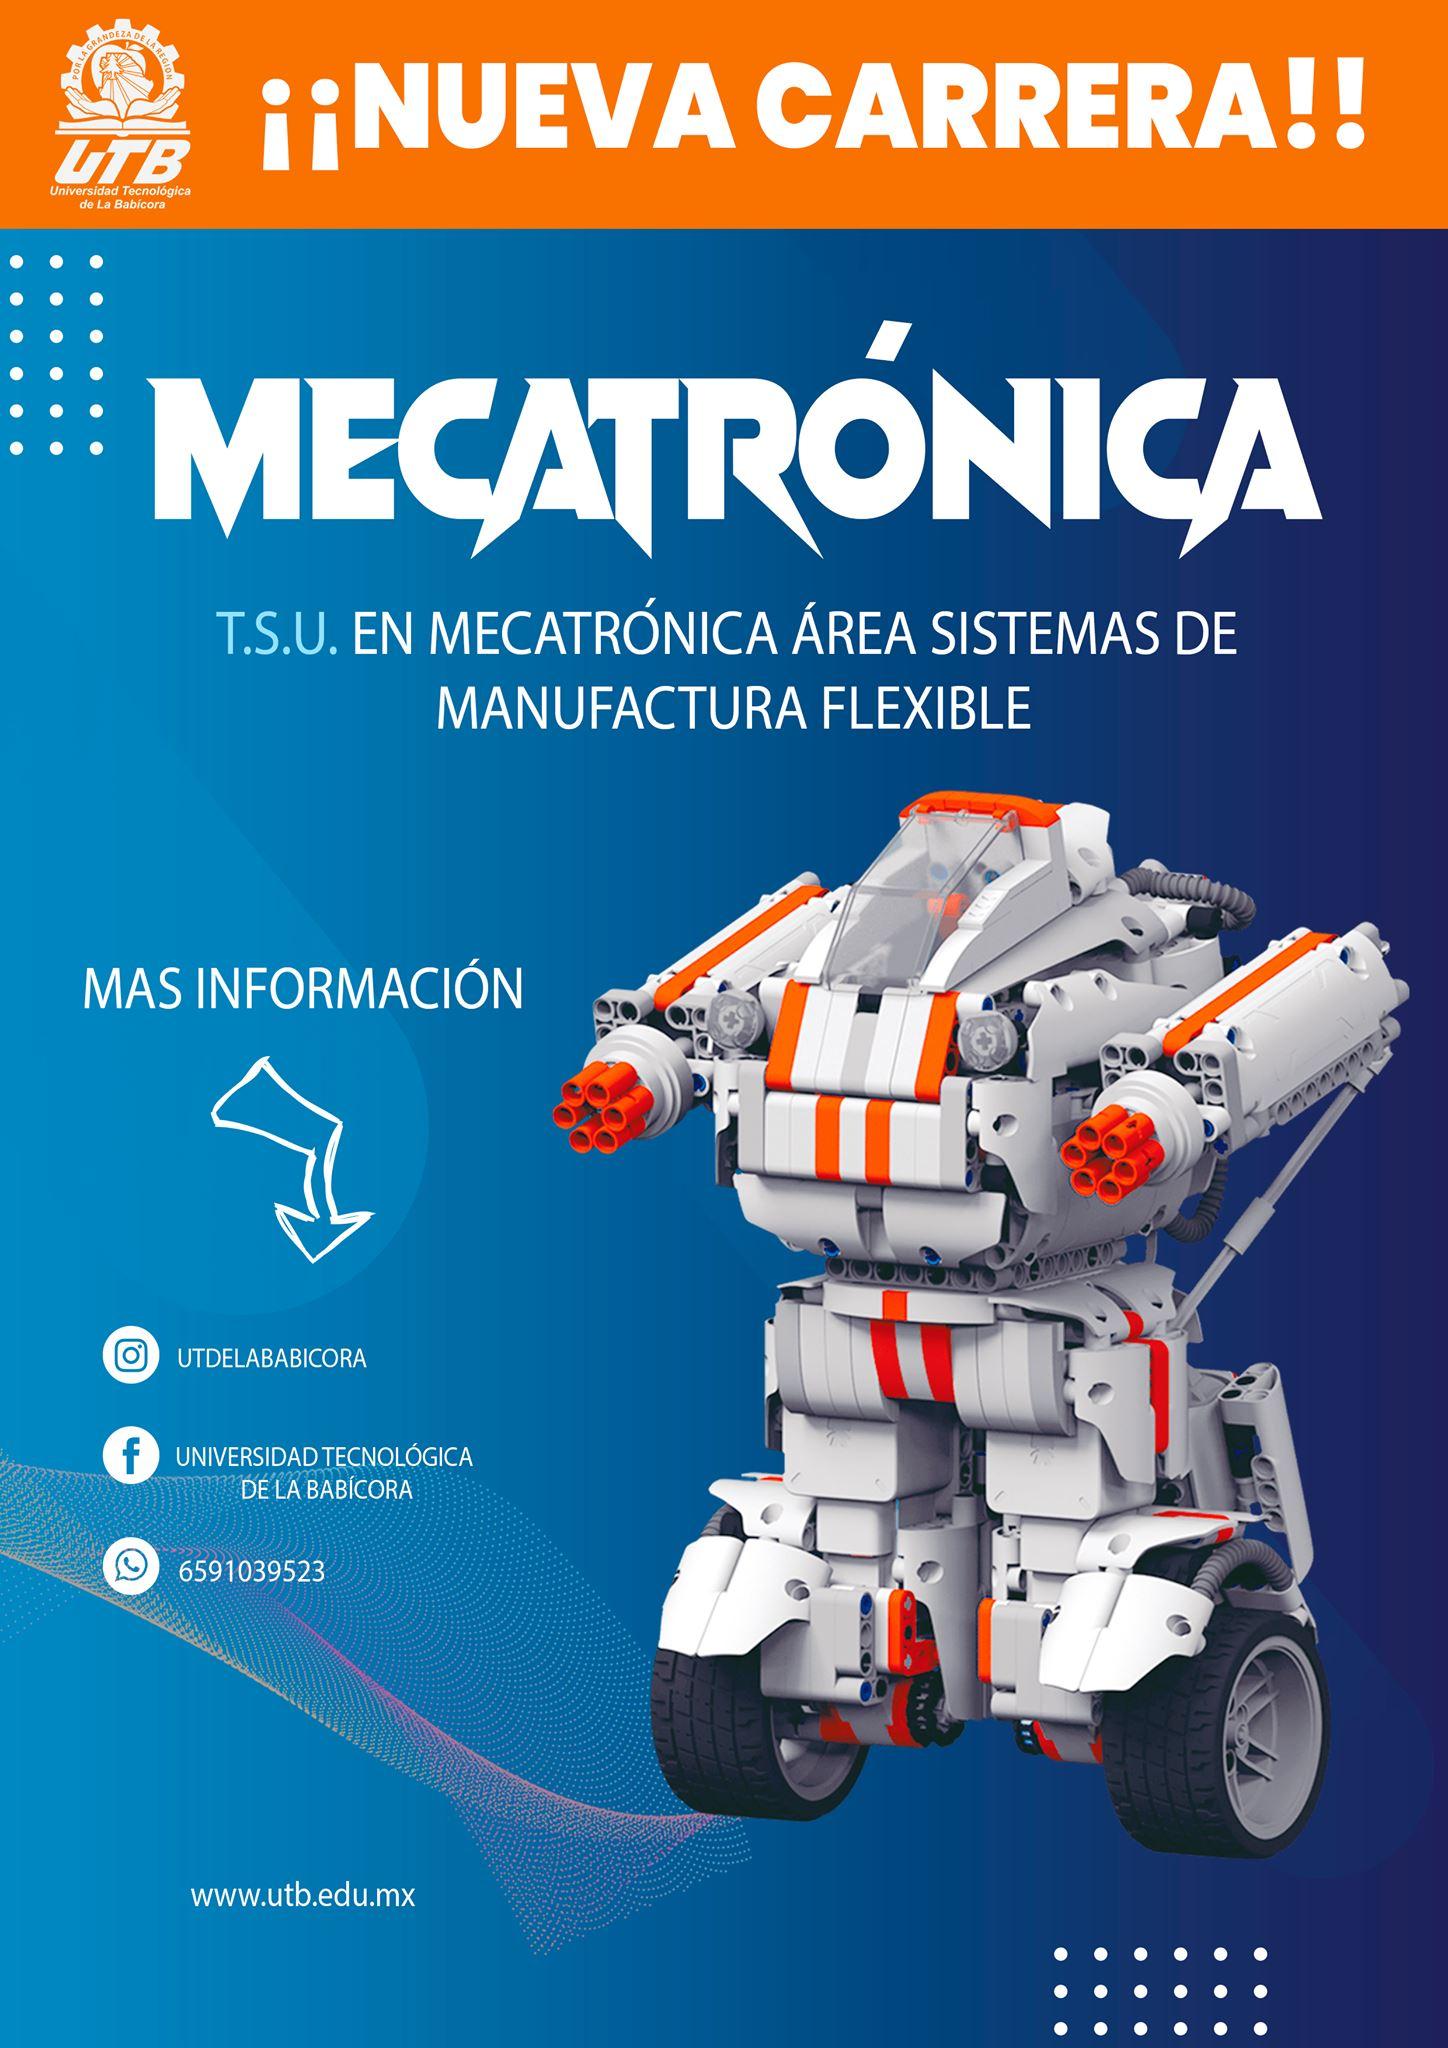 carrera mecatronica